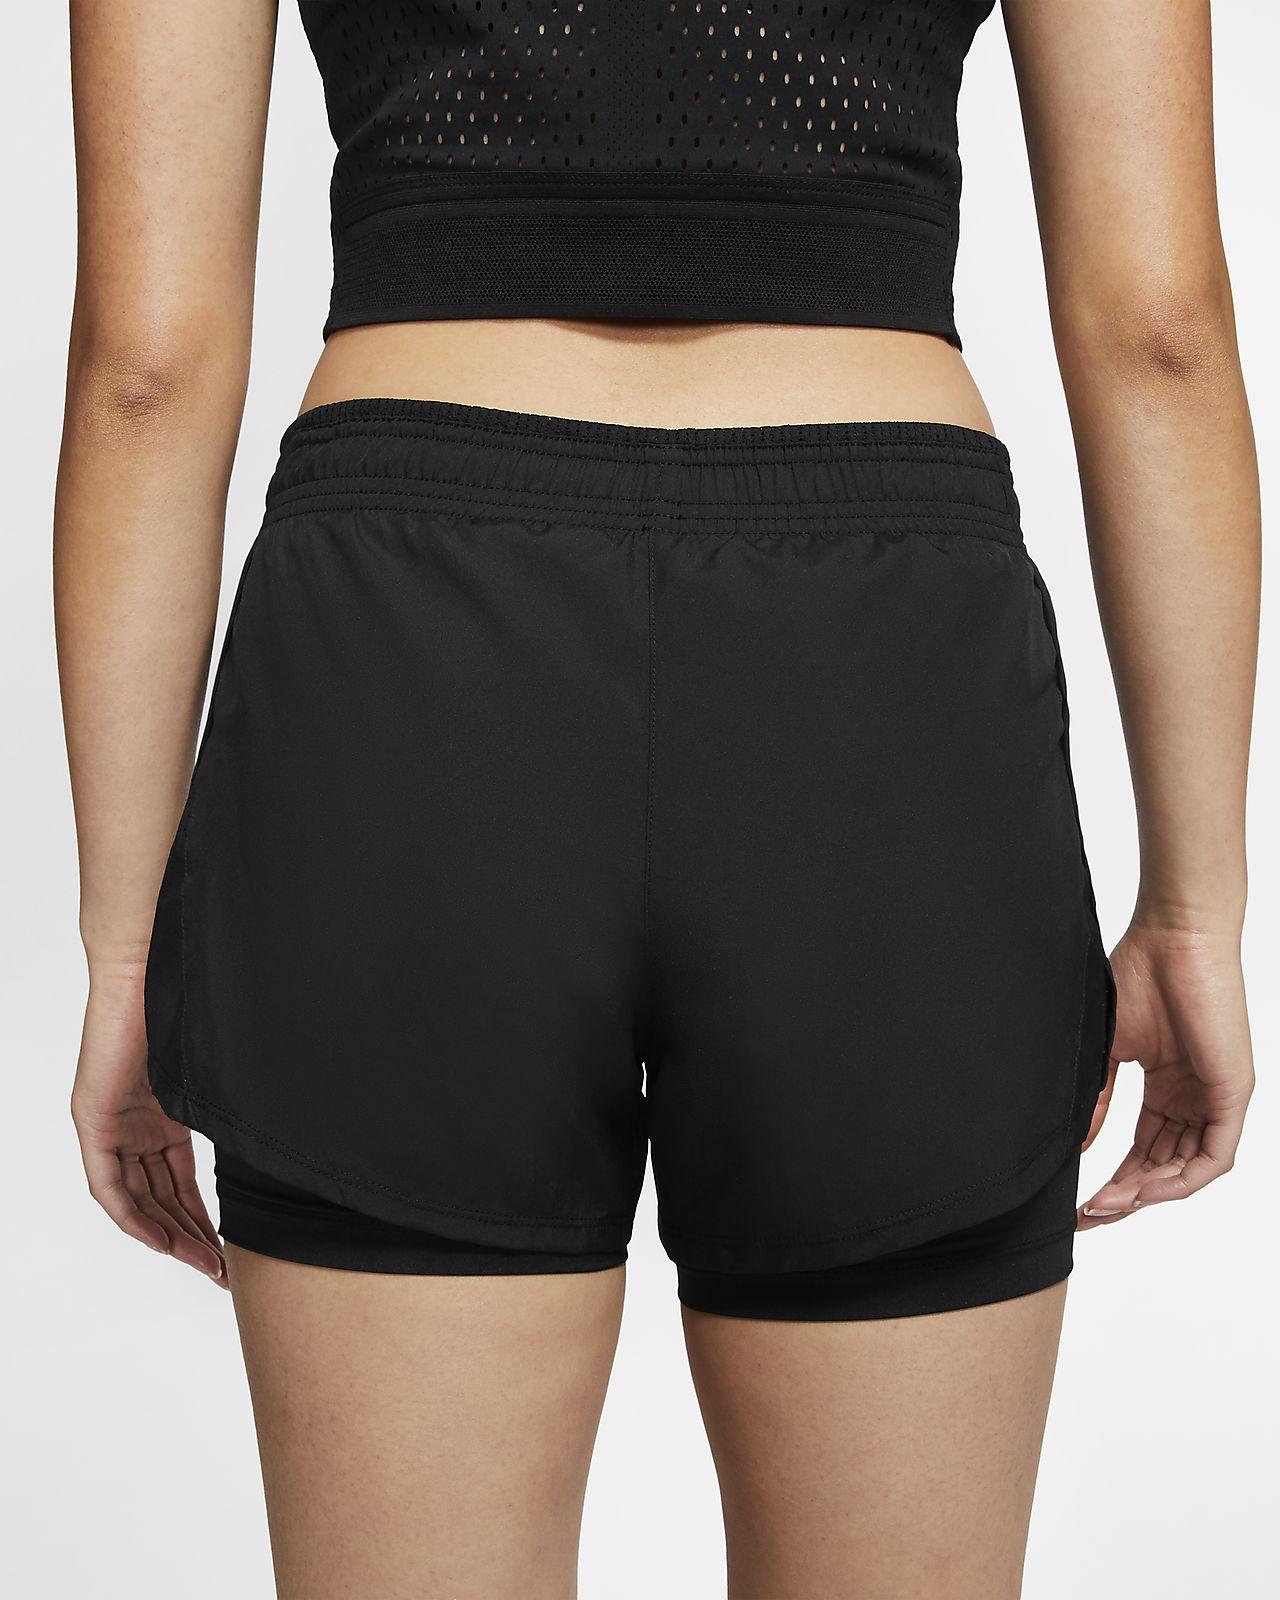 Nike Dri FIT Women's 2 in 1 Running Shorts